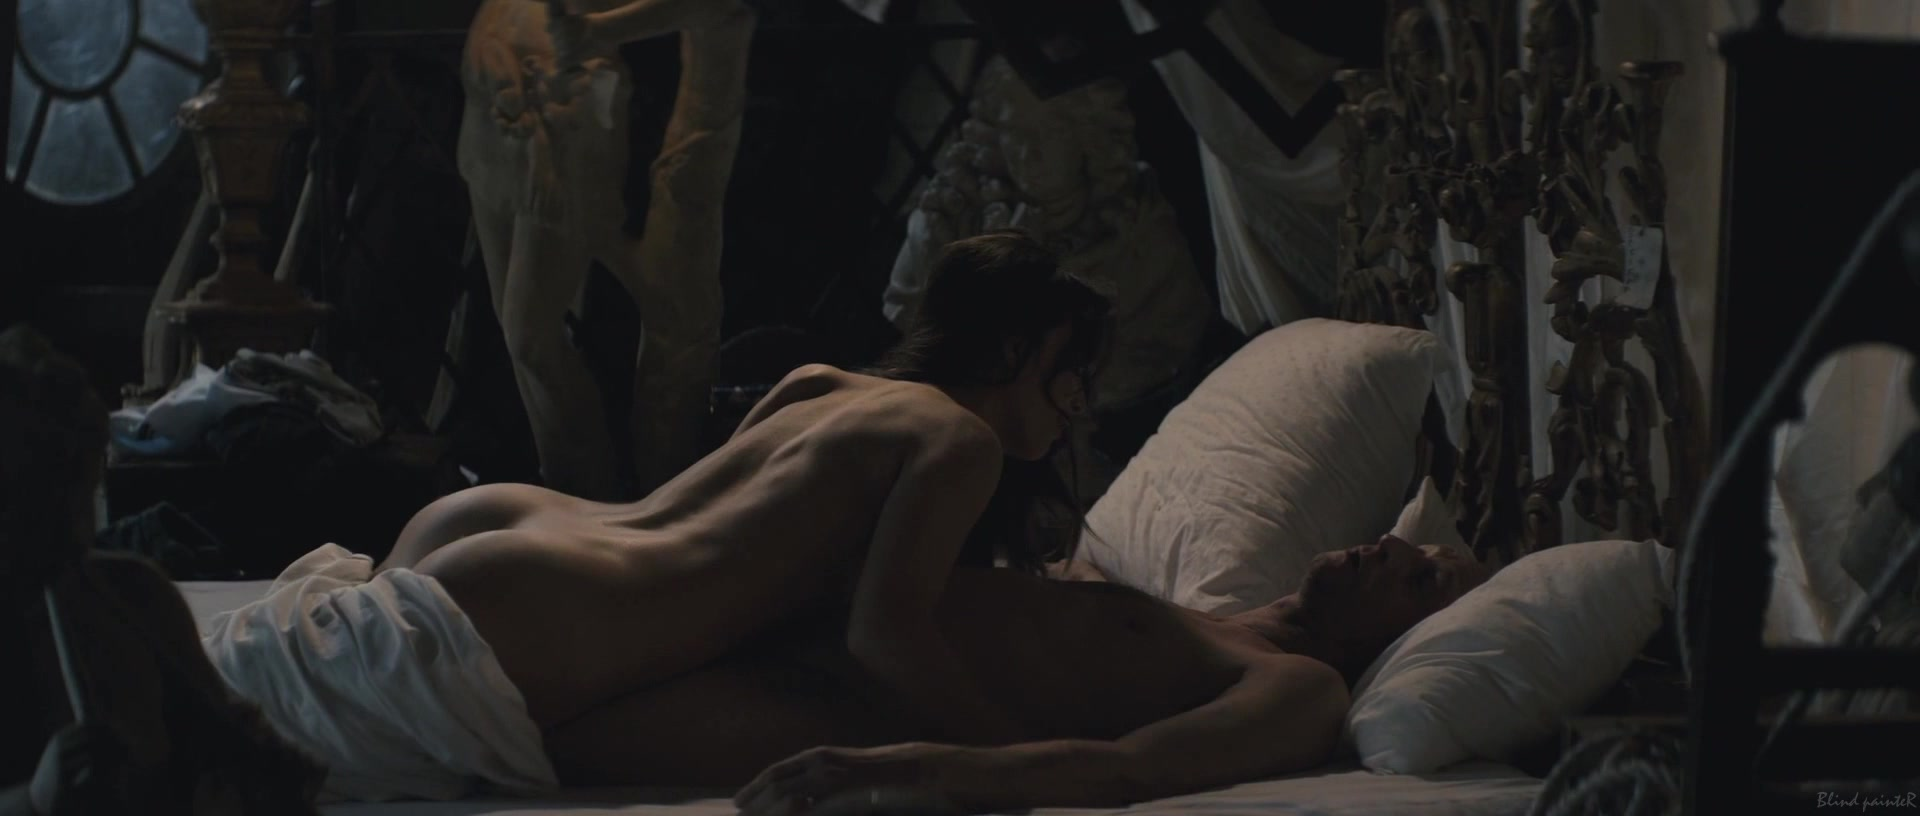 Rylance nackt Juliet  Juliet Rylance